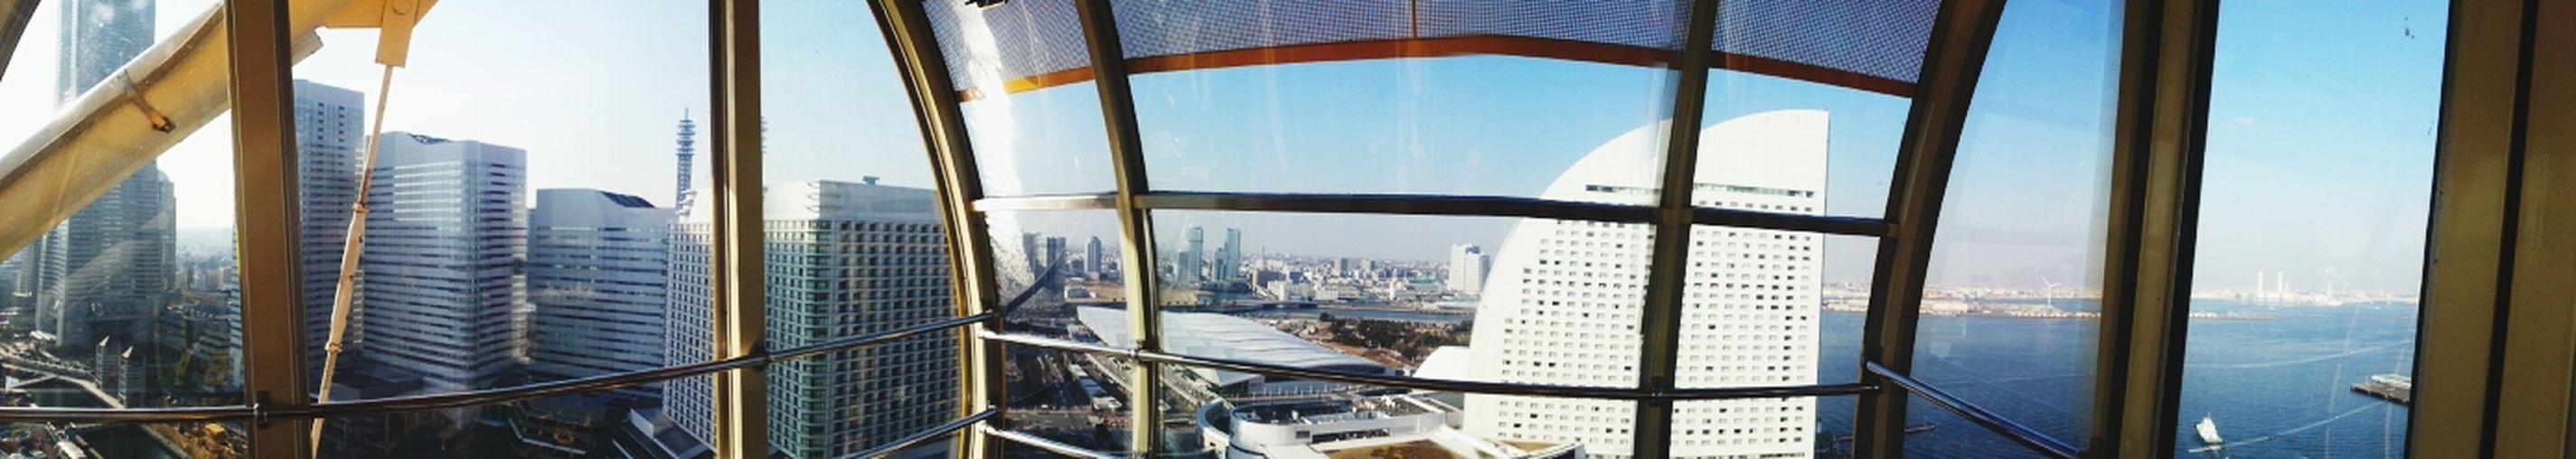 Yokohama Yokohama-shi Kanagawa I live in Totsuka